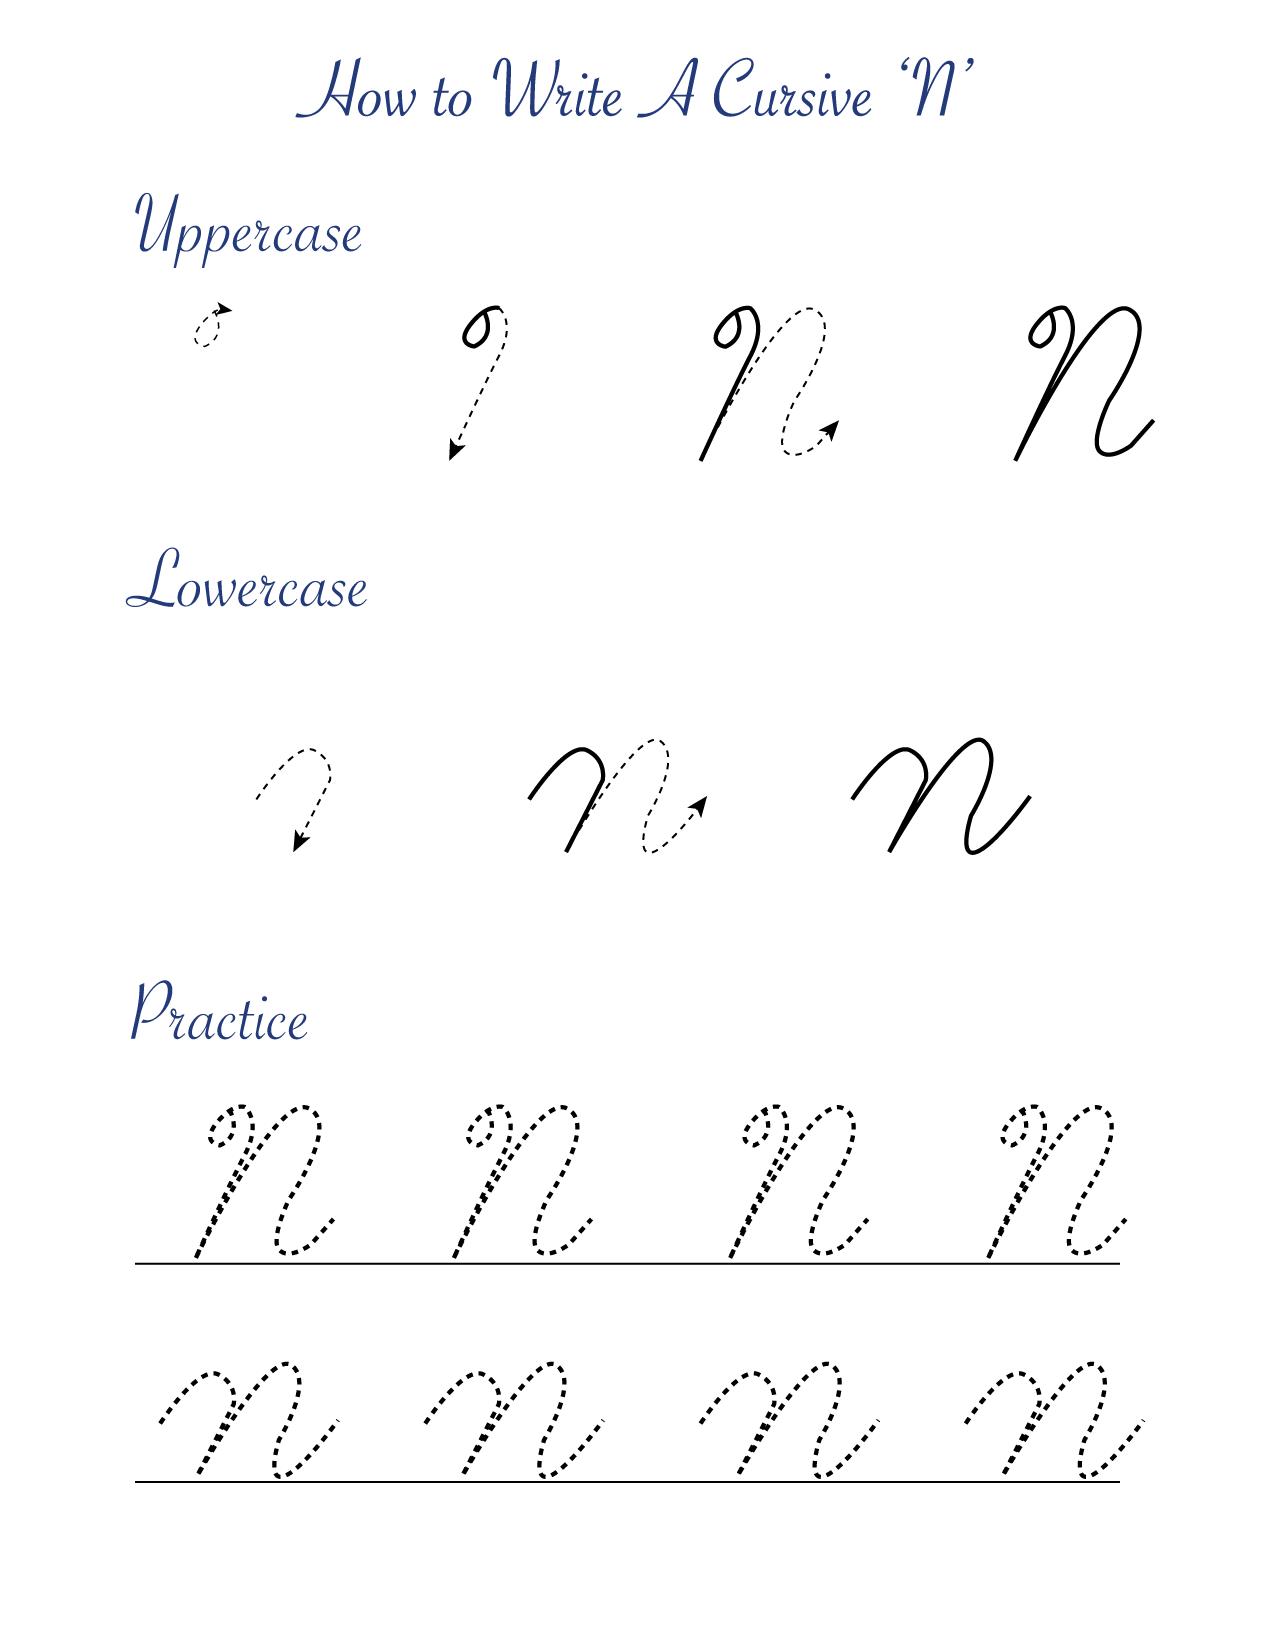 How to write a cursive 'N'